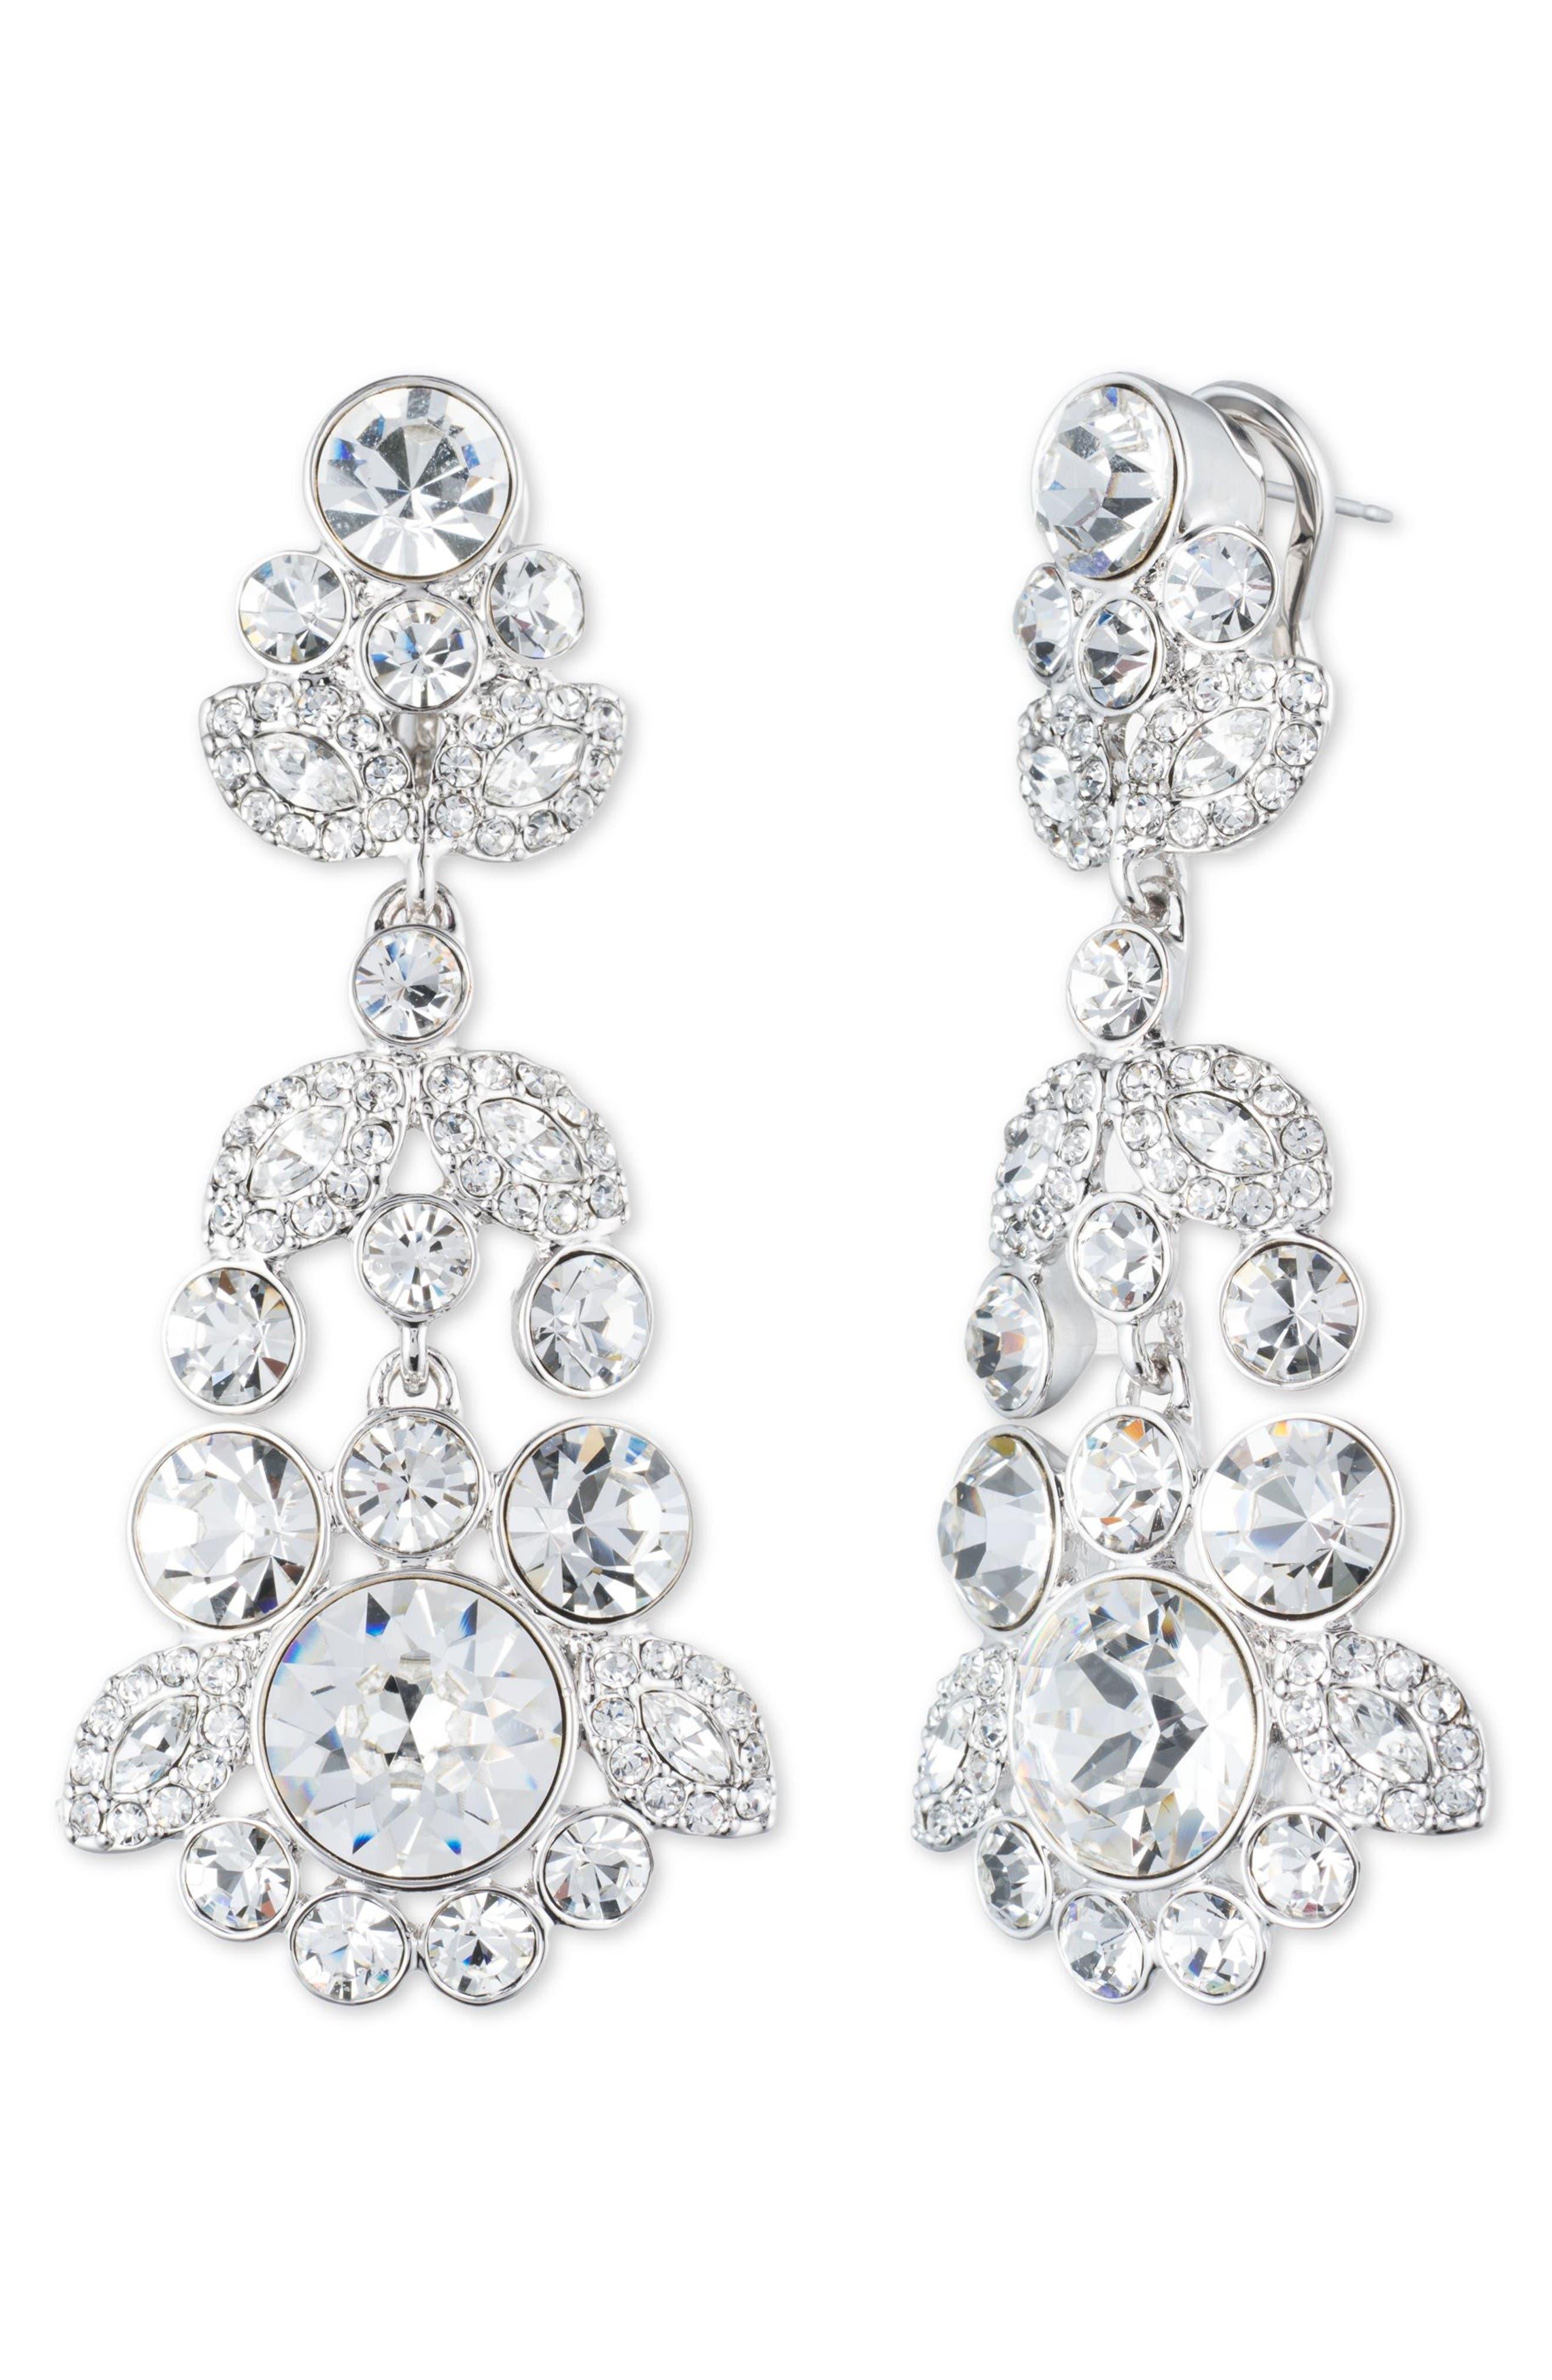 Crystal Chandelier Earrings,                         Main,                         color, Silver